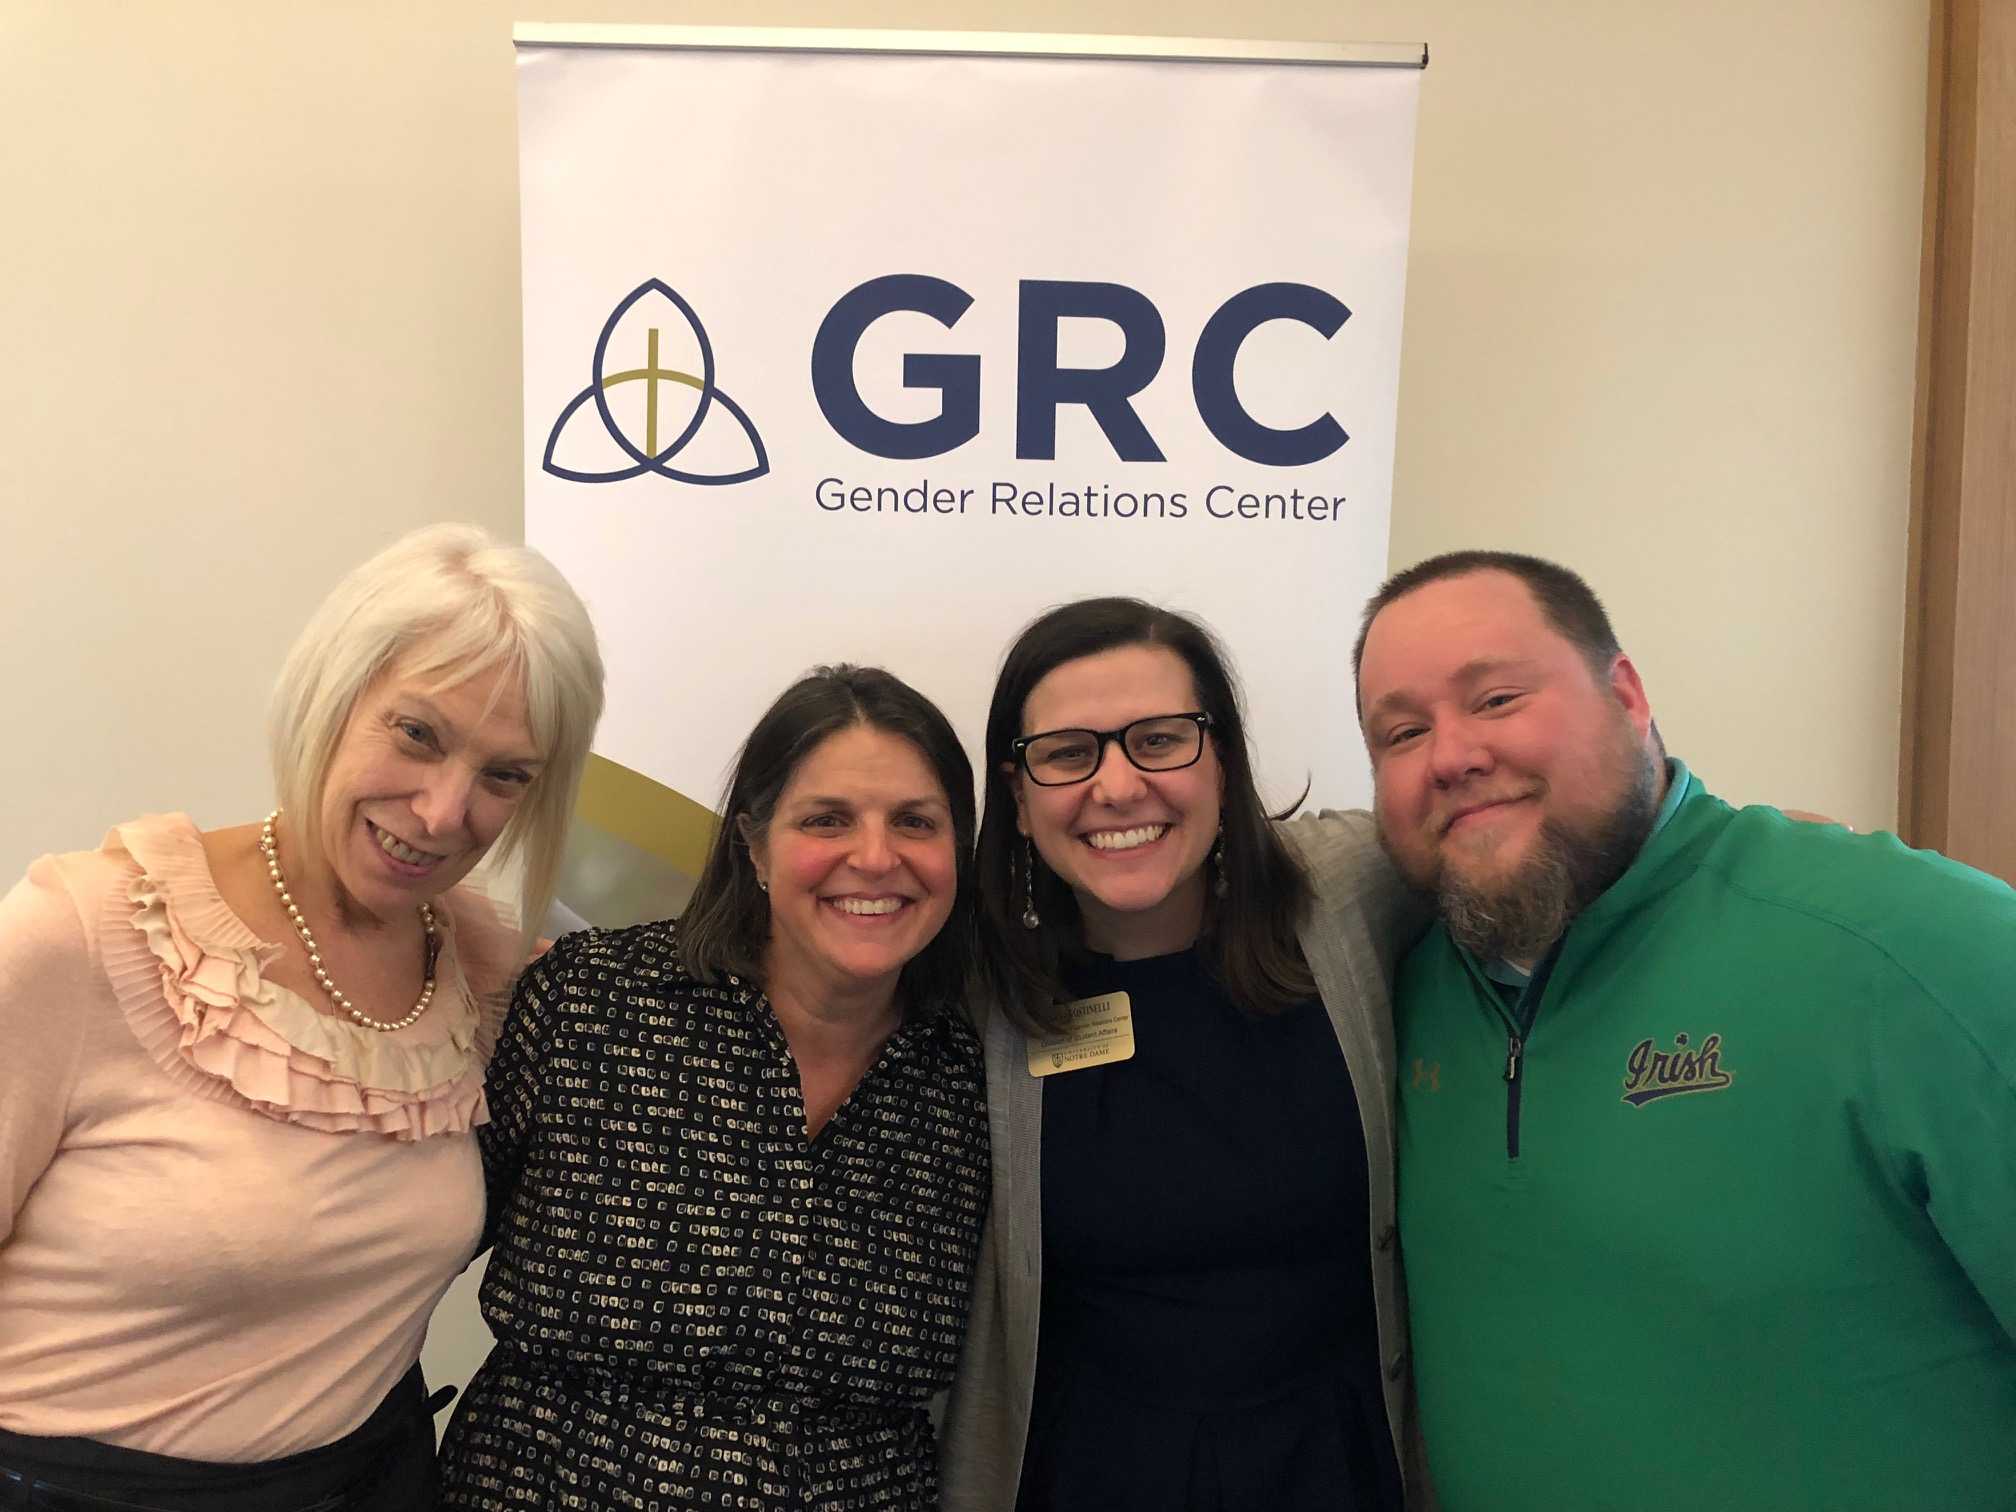 Image of GRC staff; Sara Agostinelli; John Johnstin, Marci Ullery, Christine Gebhardt, Mia James